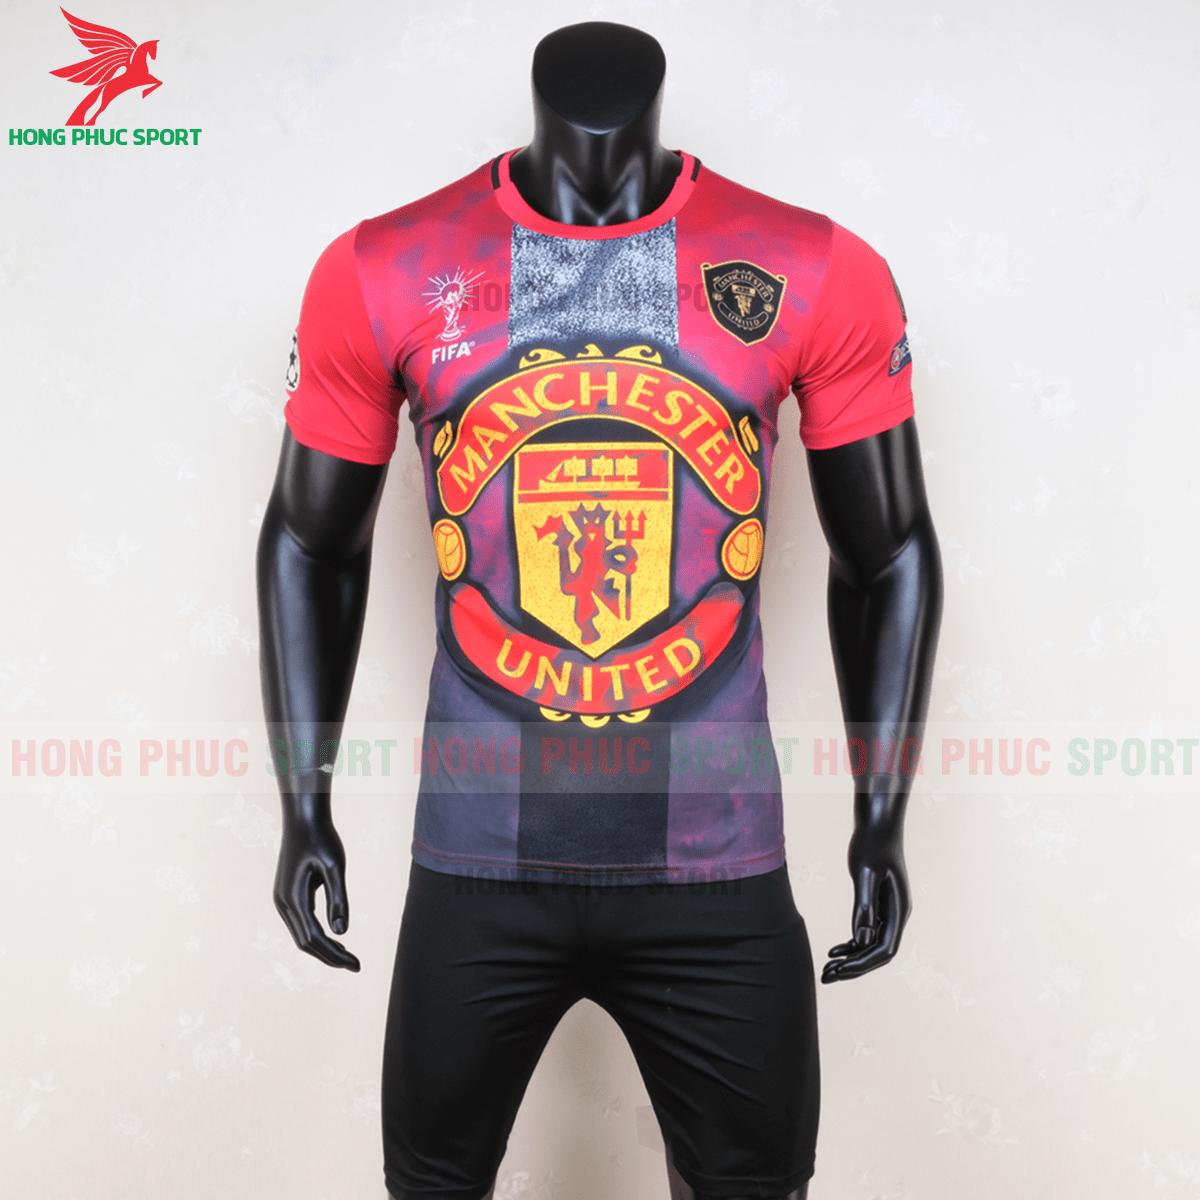 https://cdn.hongphucsport.com/unsafe/s4.shopbay.vn/files/285/ao-manchester-united-2020-phien-ban-fan-mau2-1-5f72e57b68853.png